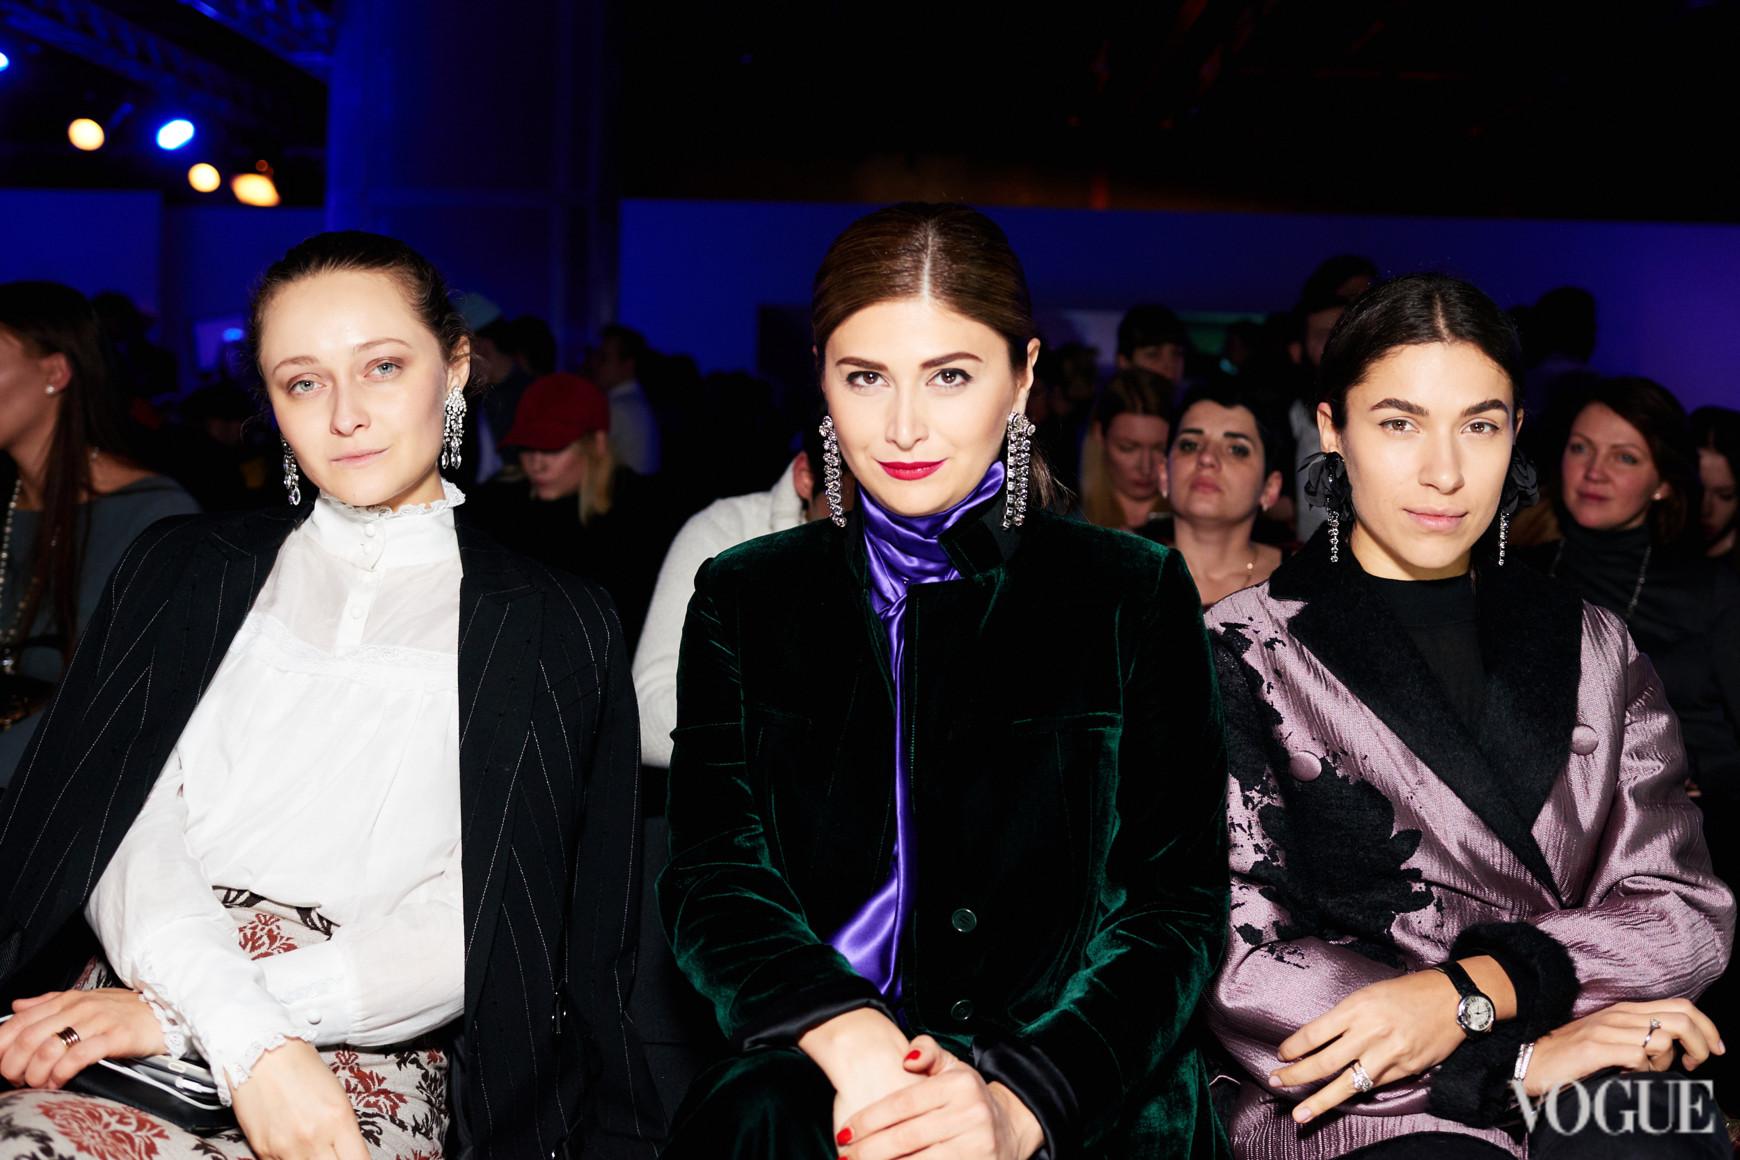 Дарья Шаповалова, Нина Васадзе и Ульяна Бойко